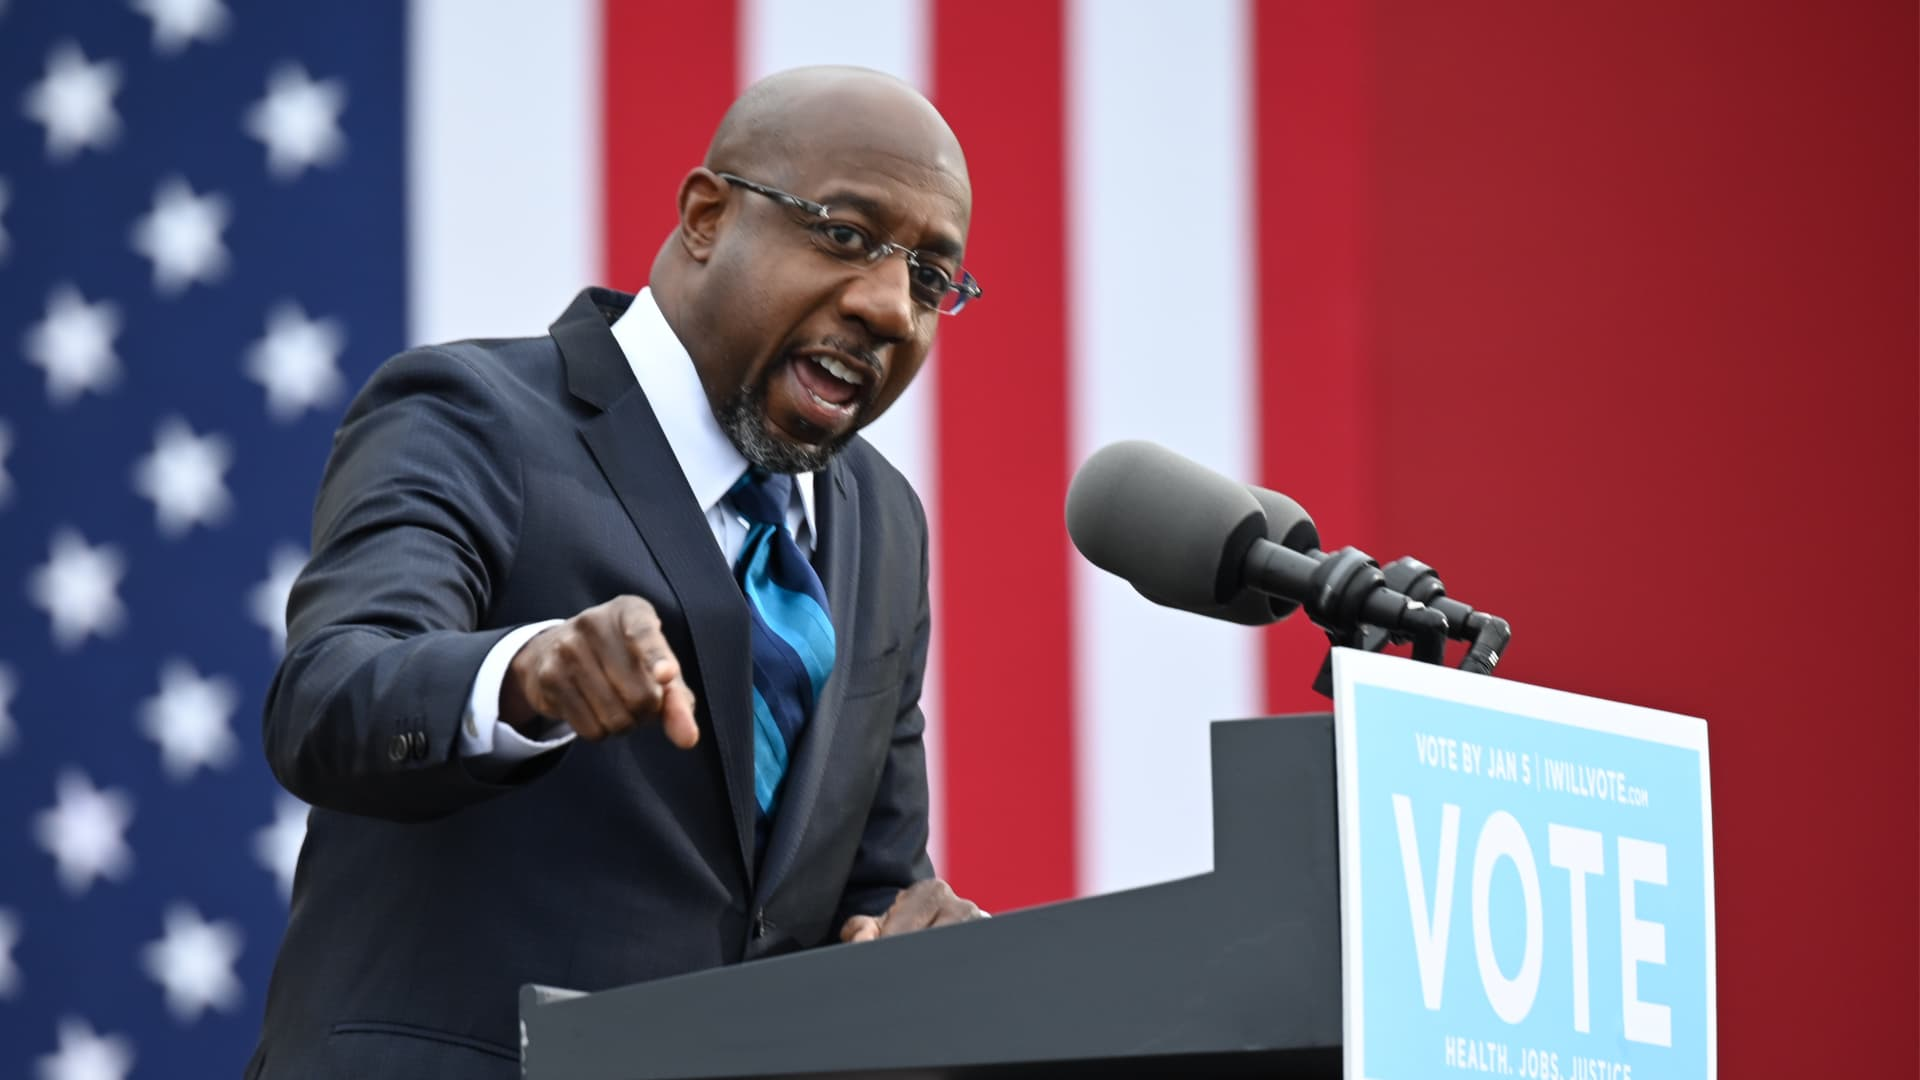 Democratic Senate candidate Reverend Raphael Warnock speaks during a campaign rally in Atlanta, Georgia on December 15, 2020.